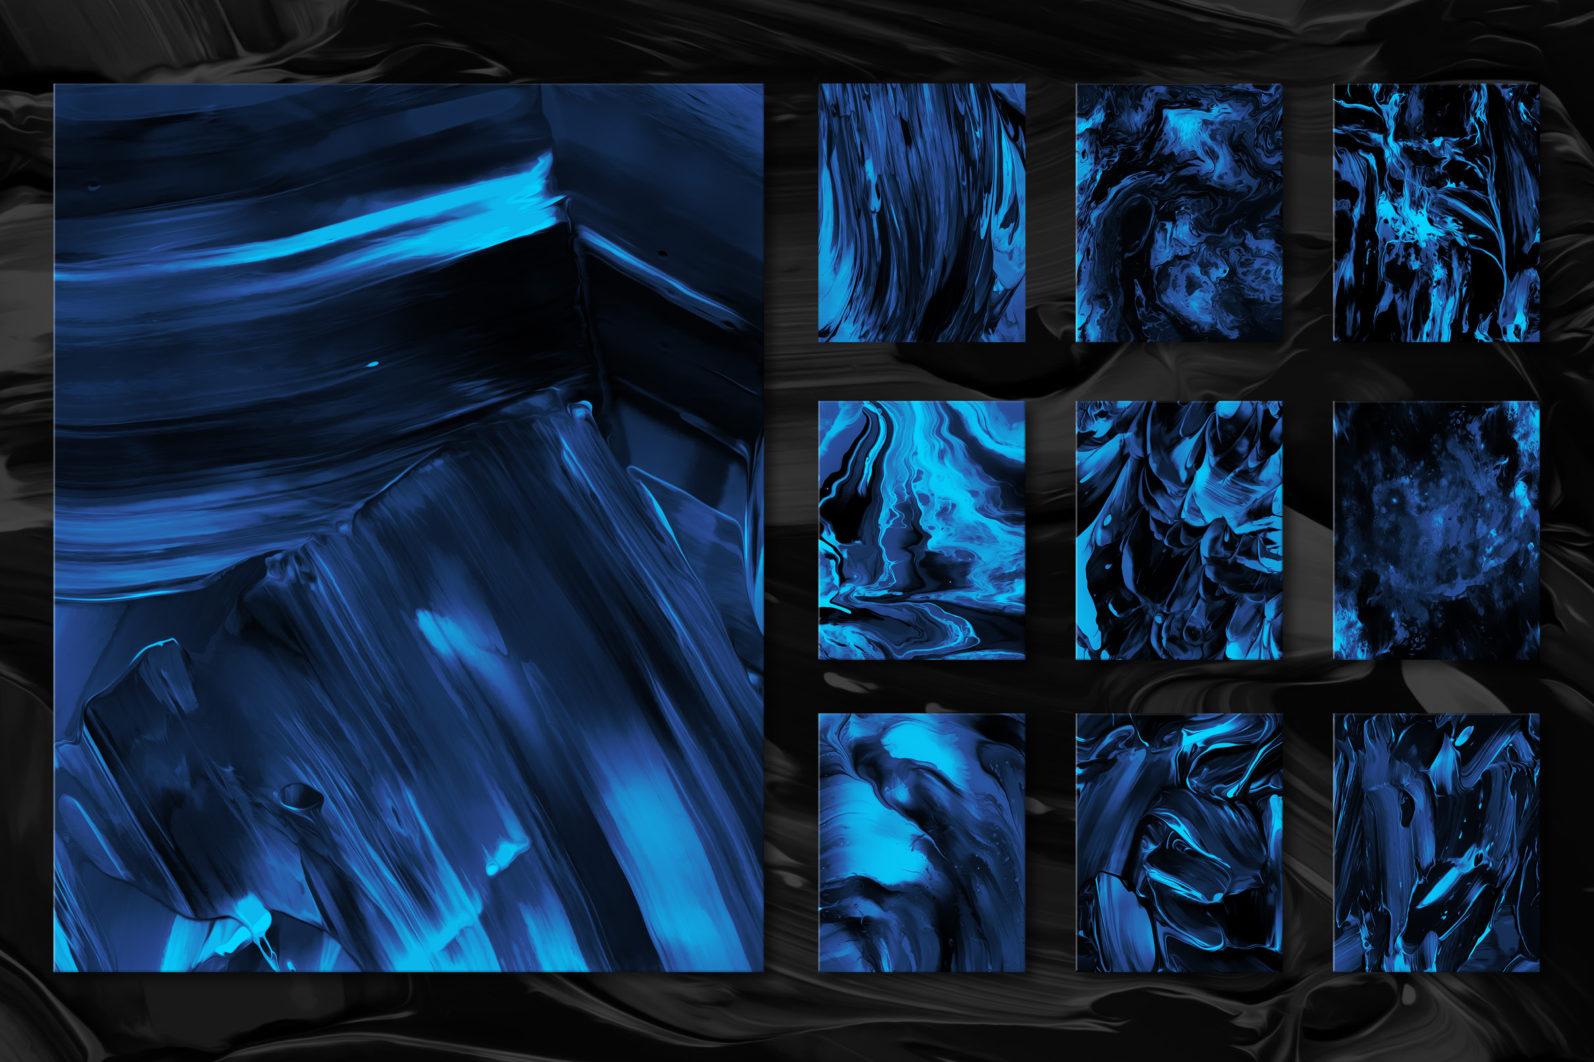 Flow, Vol. 2: 100 Smooth Paint Textures - Flow Vol 2 Preview 12 -